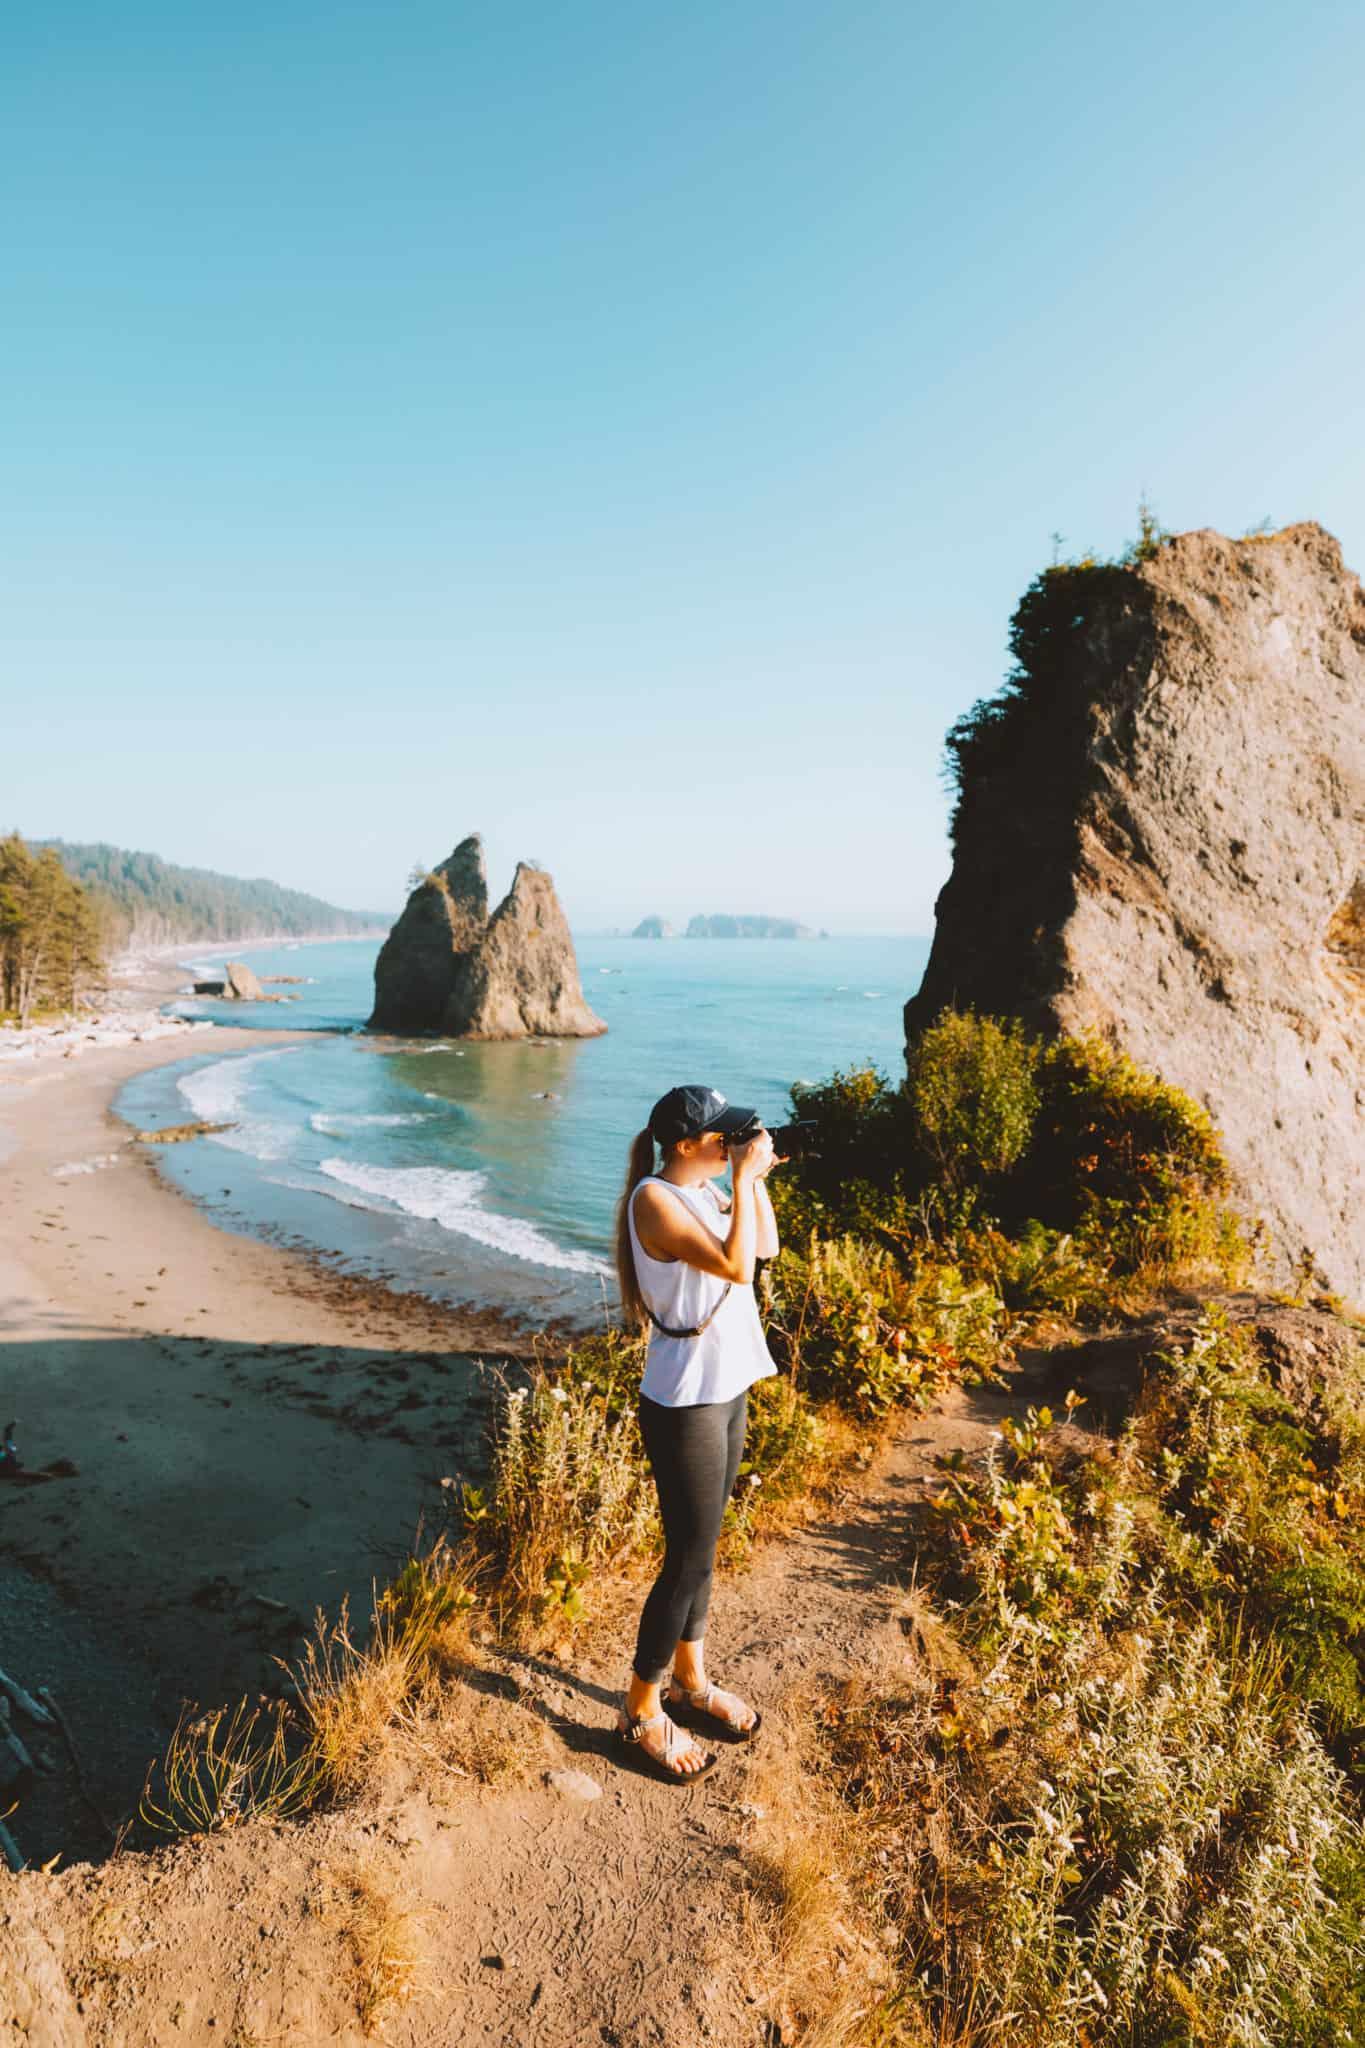 Olympic Peninsula Road Trip Route - Rialto Beach Viewpoint